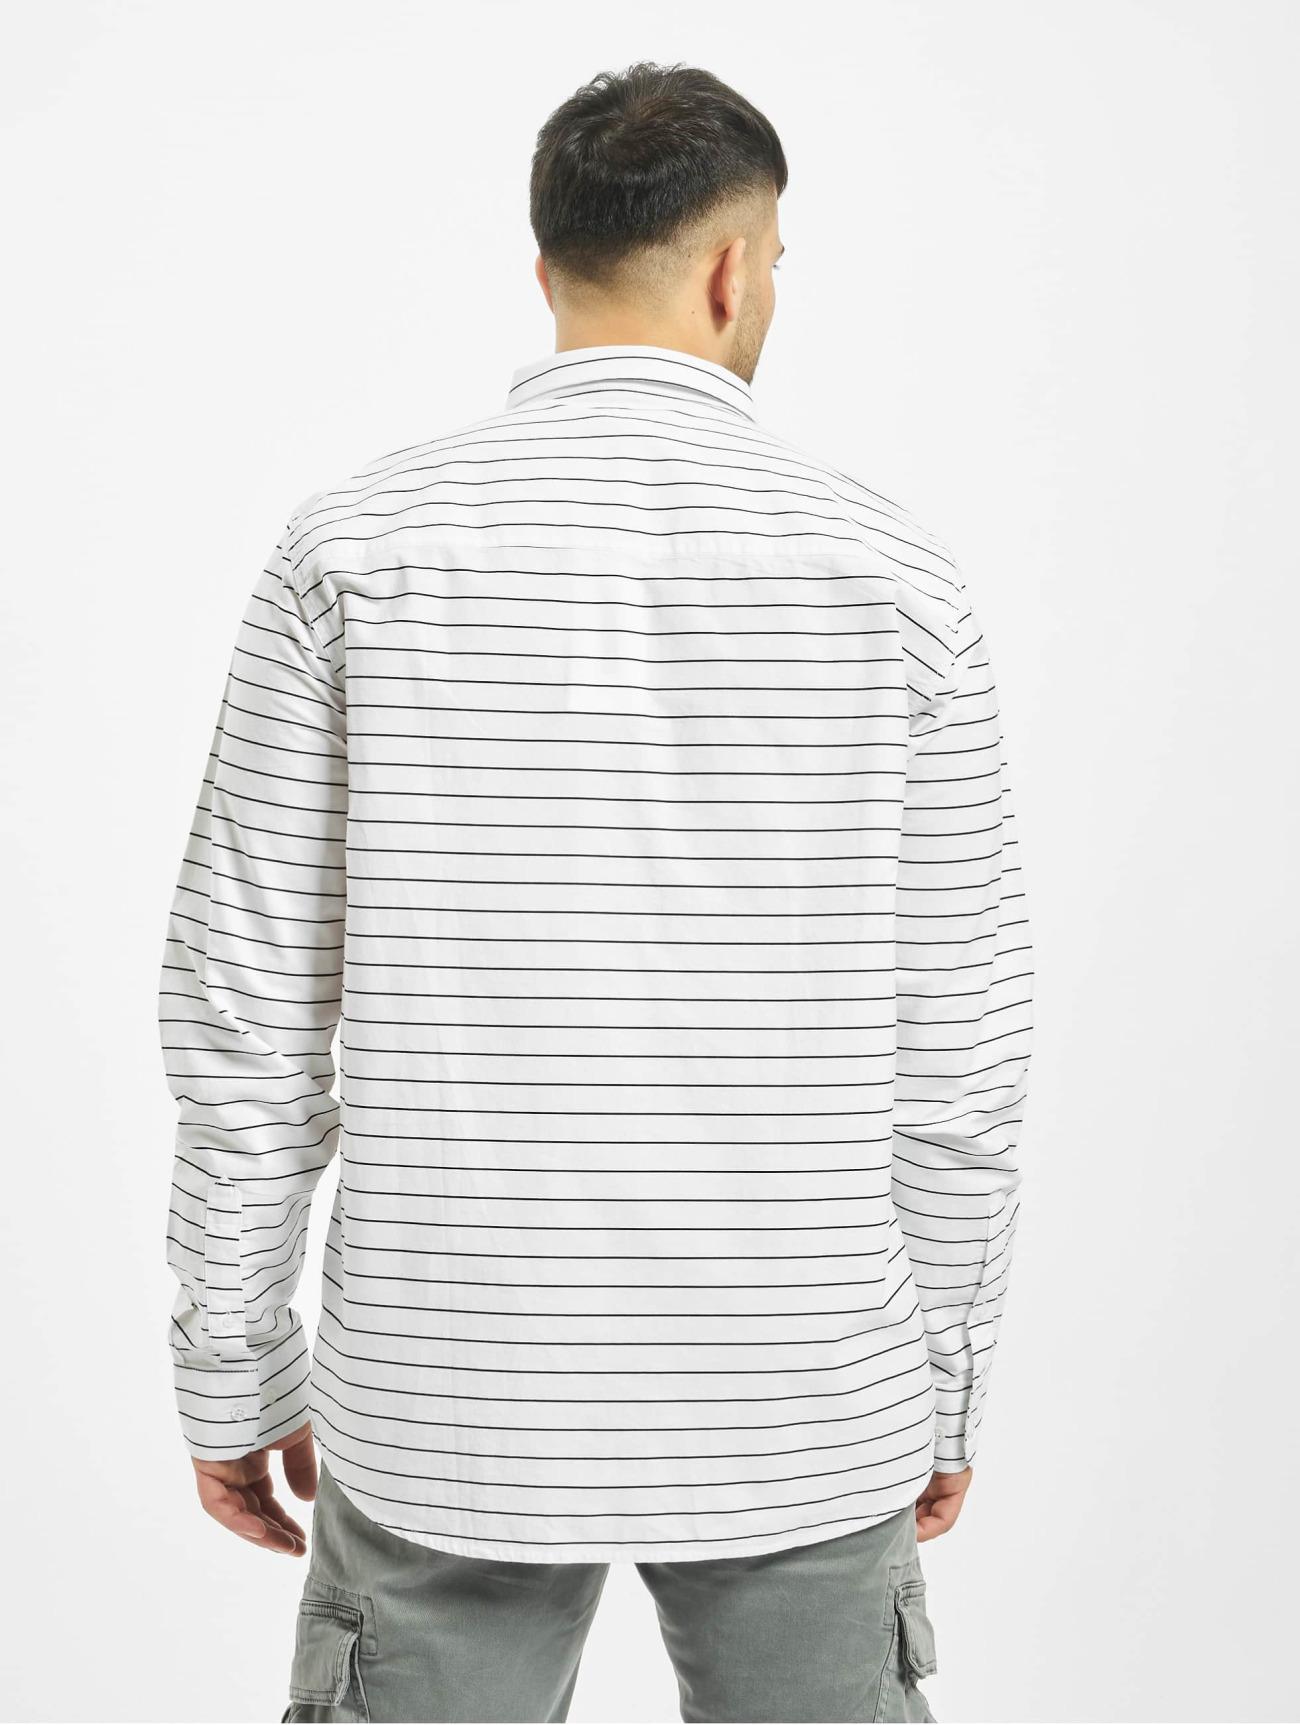 Wemoto | Como   blanc Homme Chemise  550669| Homme Hauts